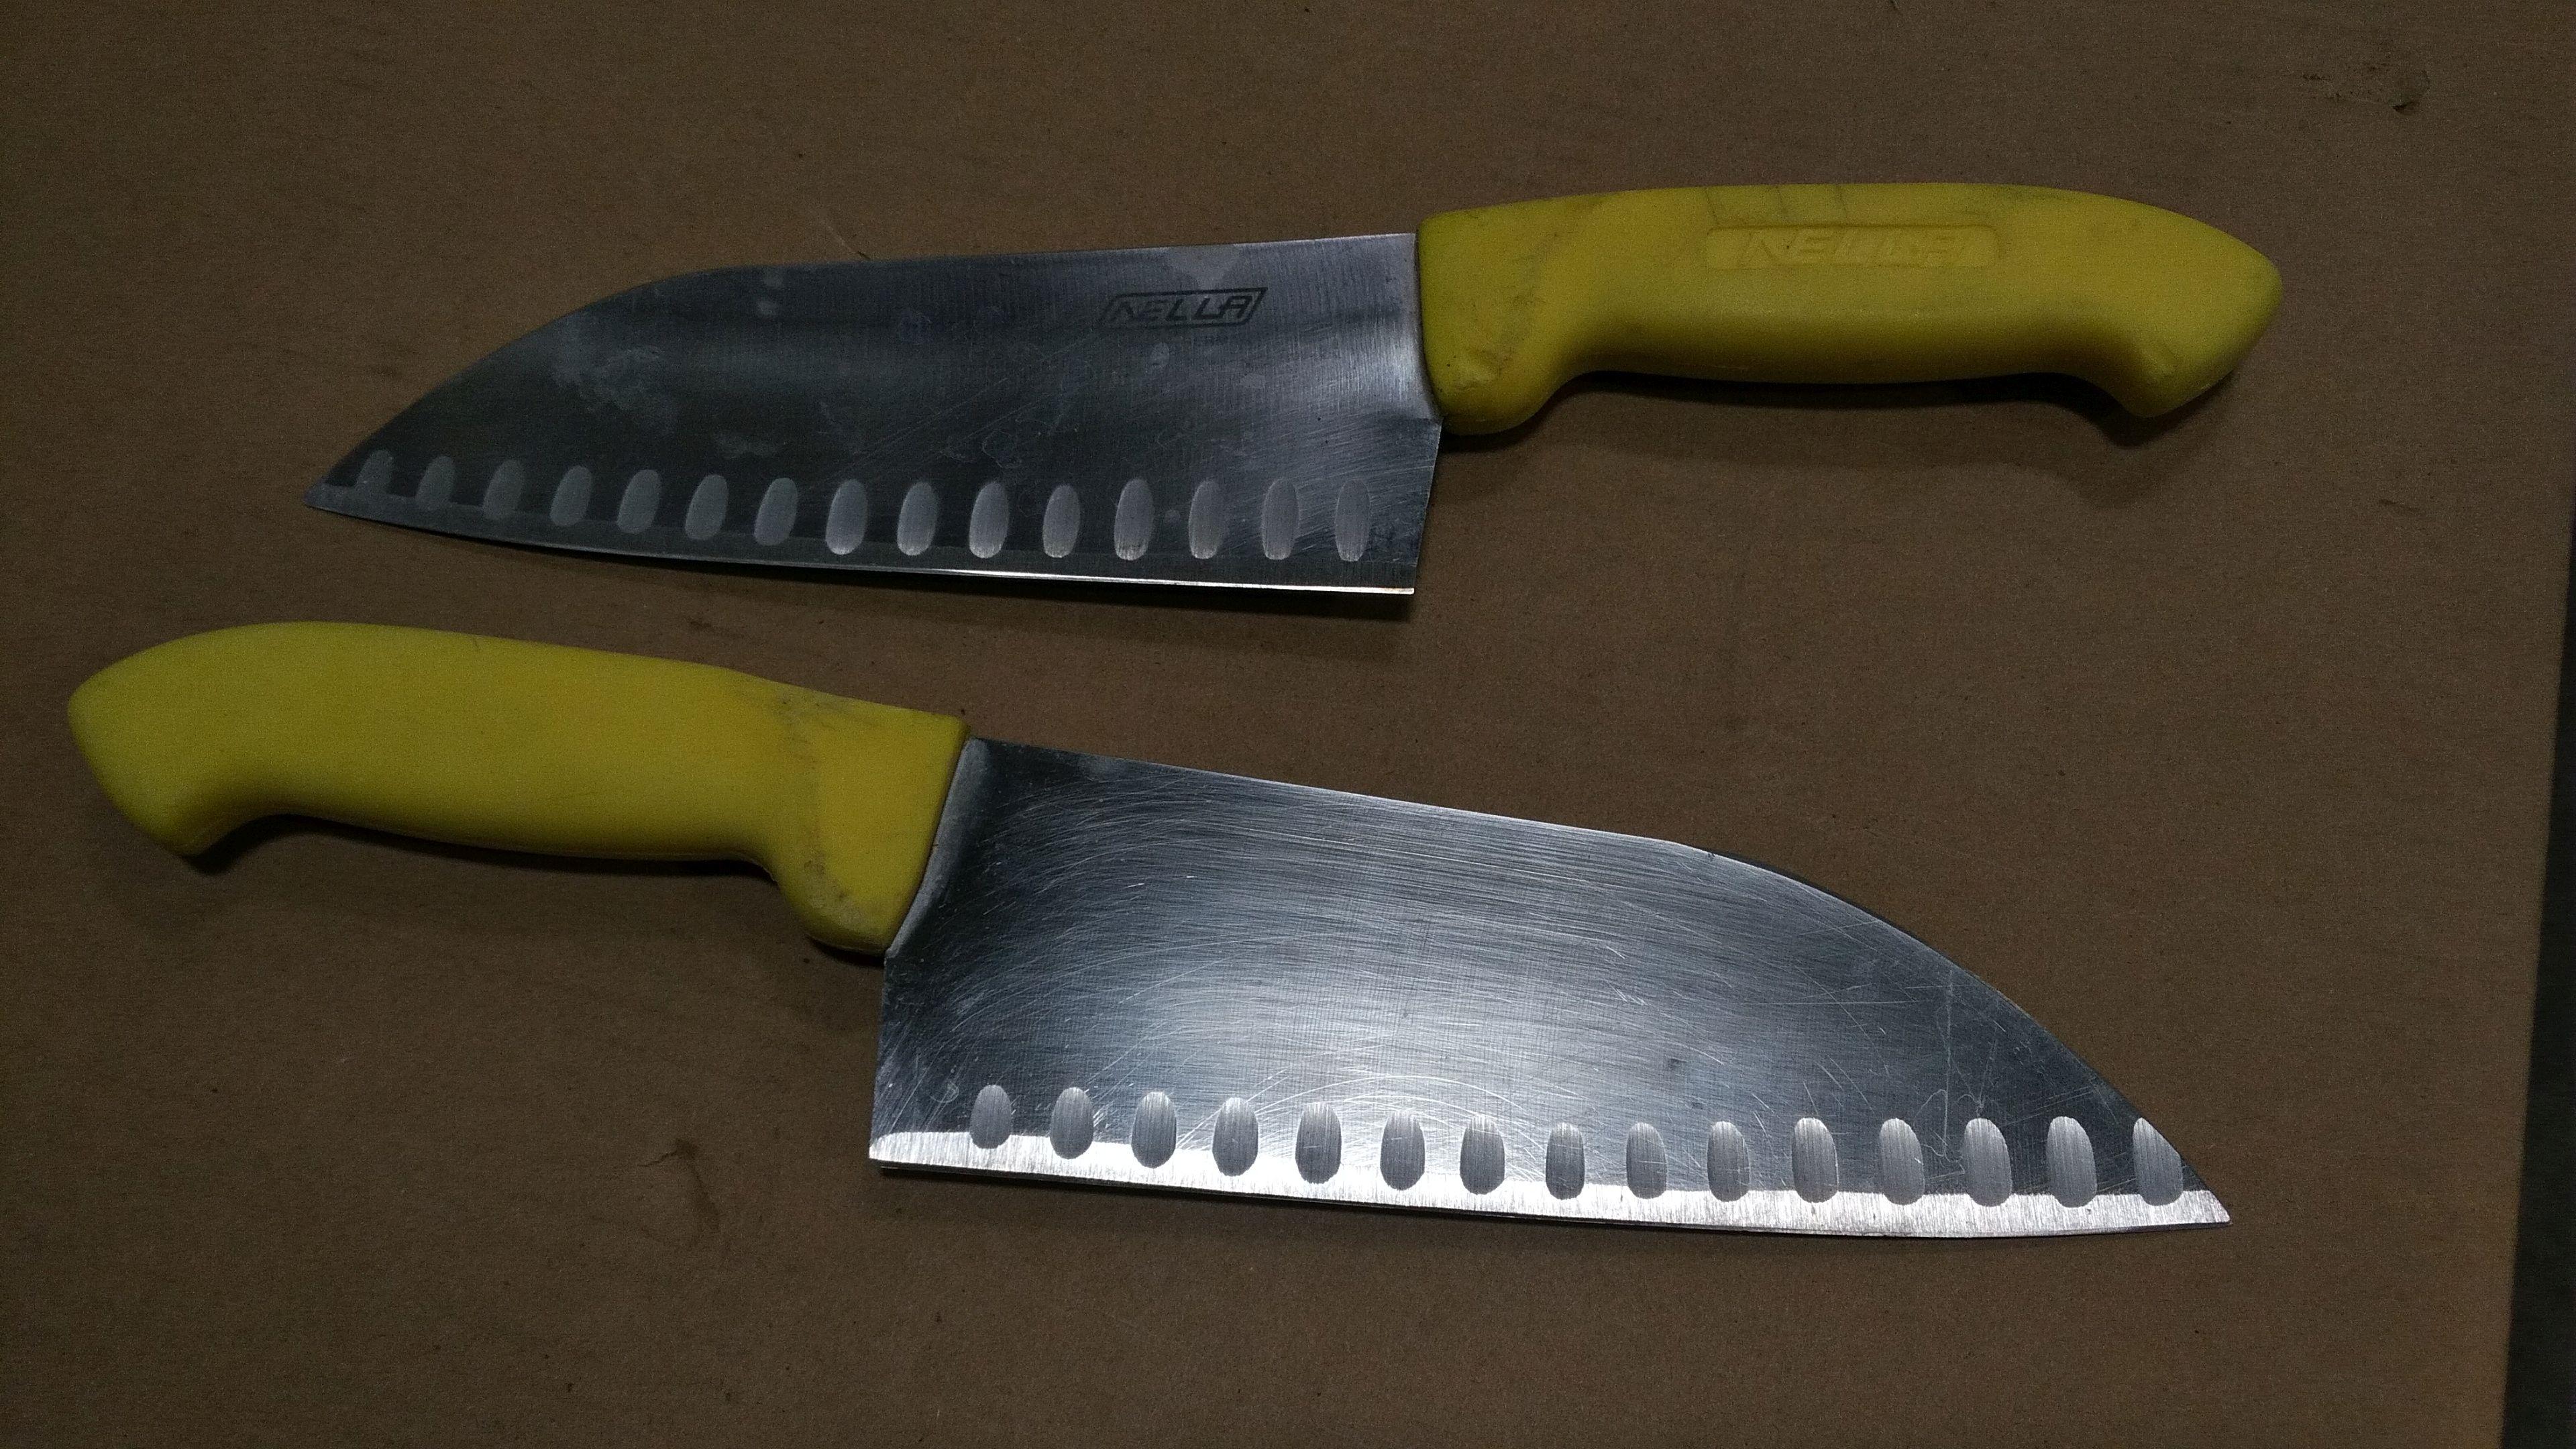 Lot 23 - Used/Sharpened Yellow Santoku Knives - lot of 2